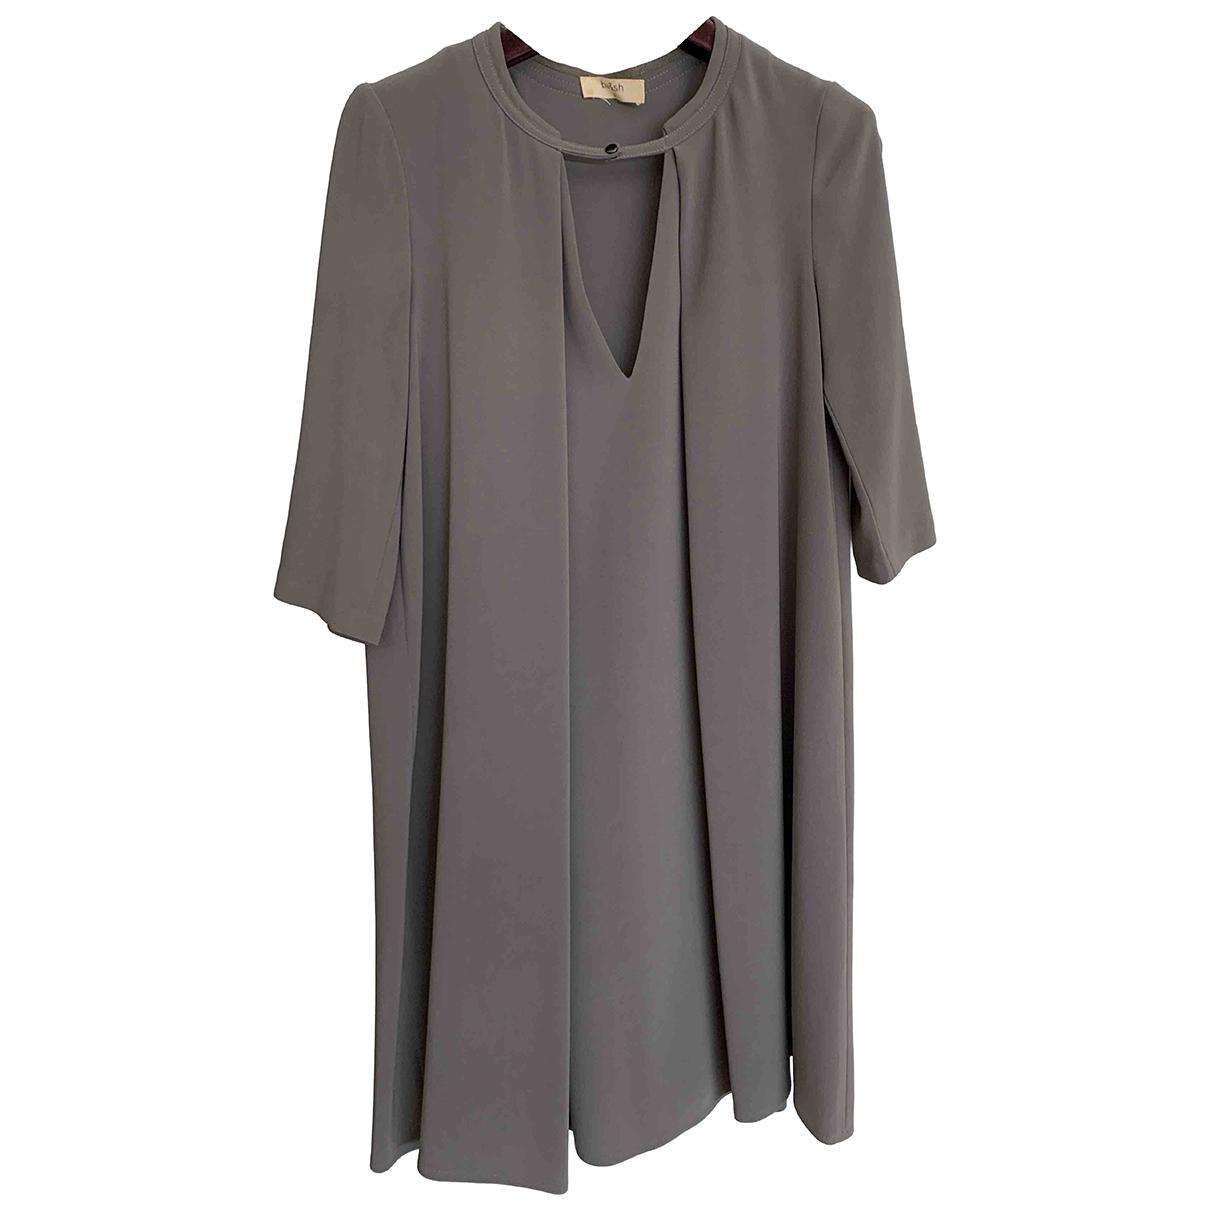 Ba&sh \N Kleid in  Khaki Polyester